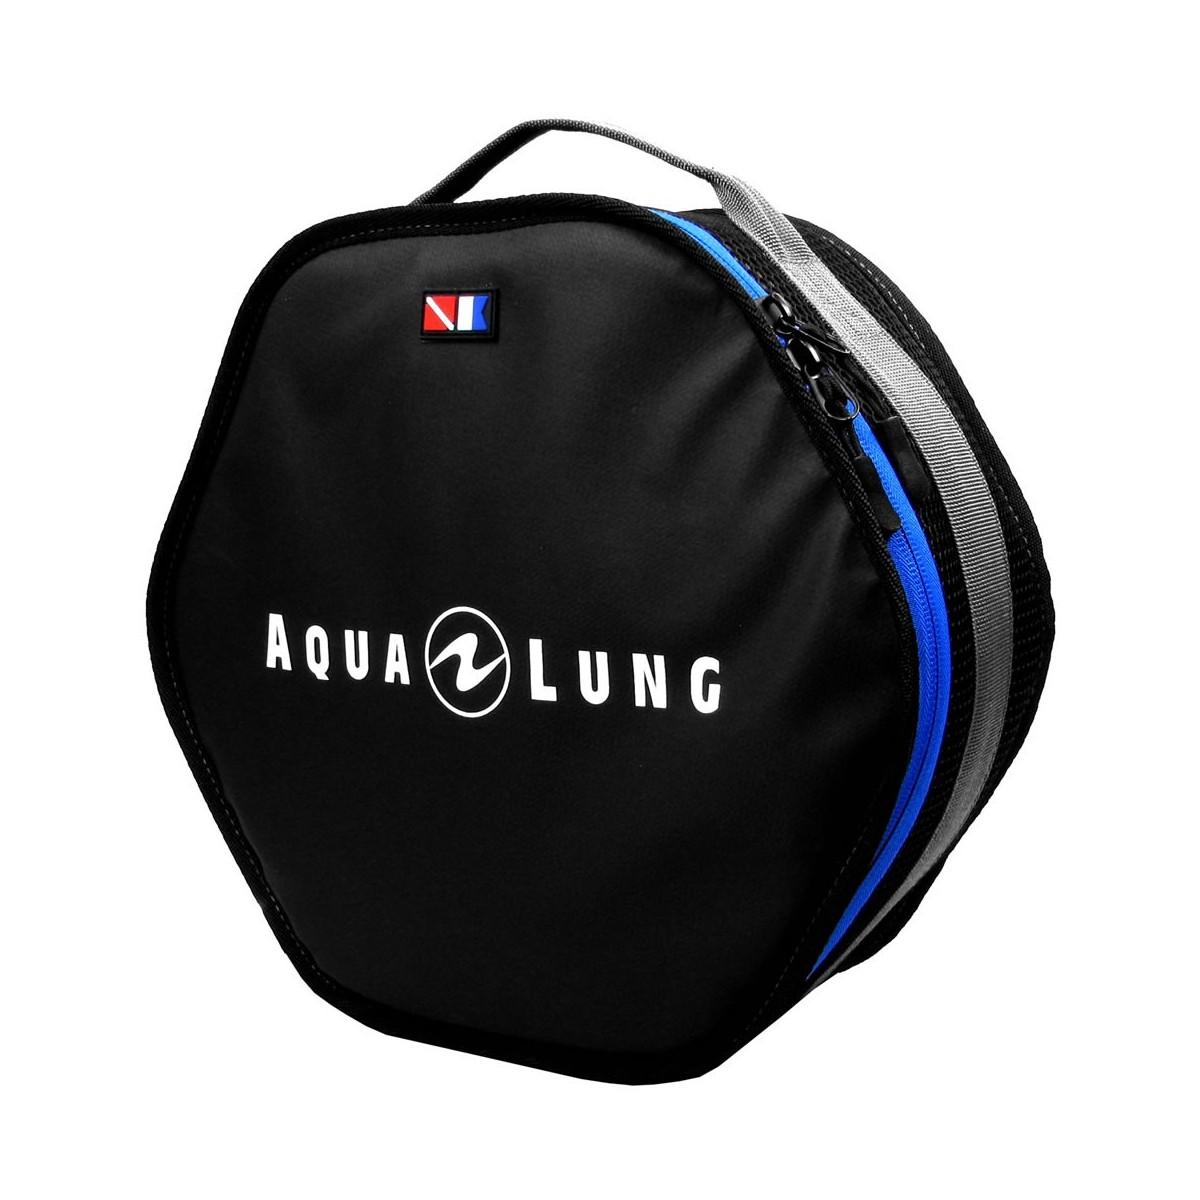 Aqua lung Explorer Collection Regulator Bag